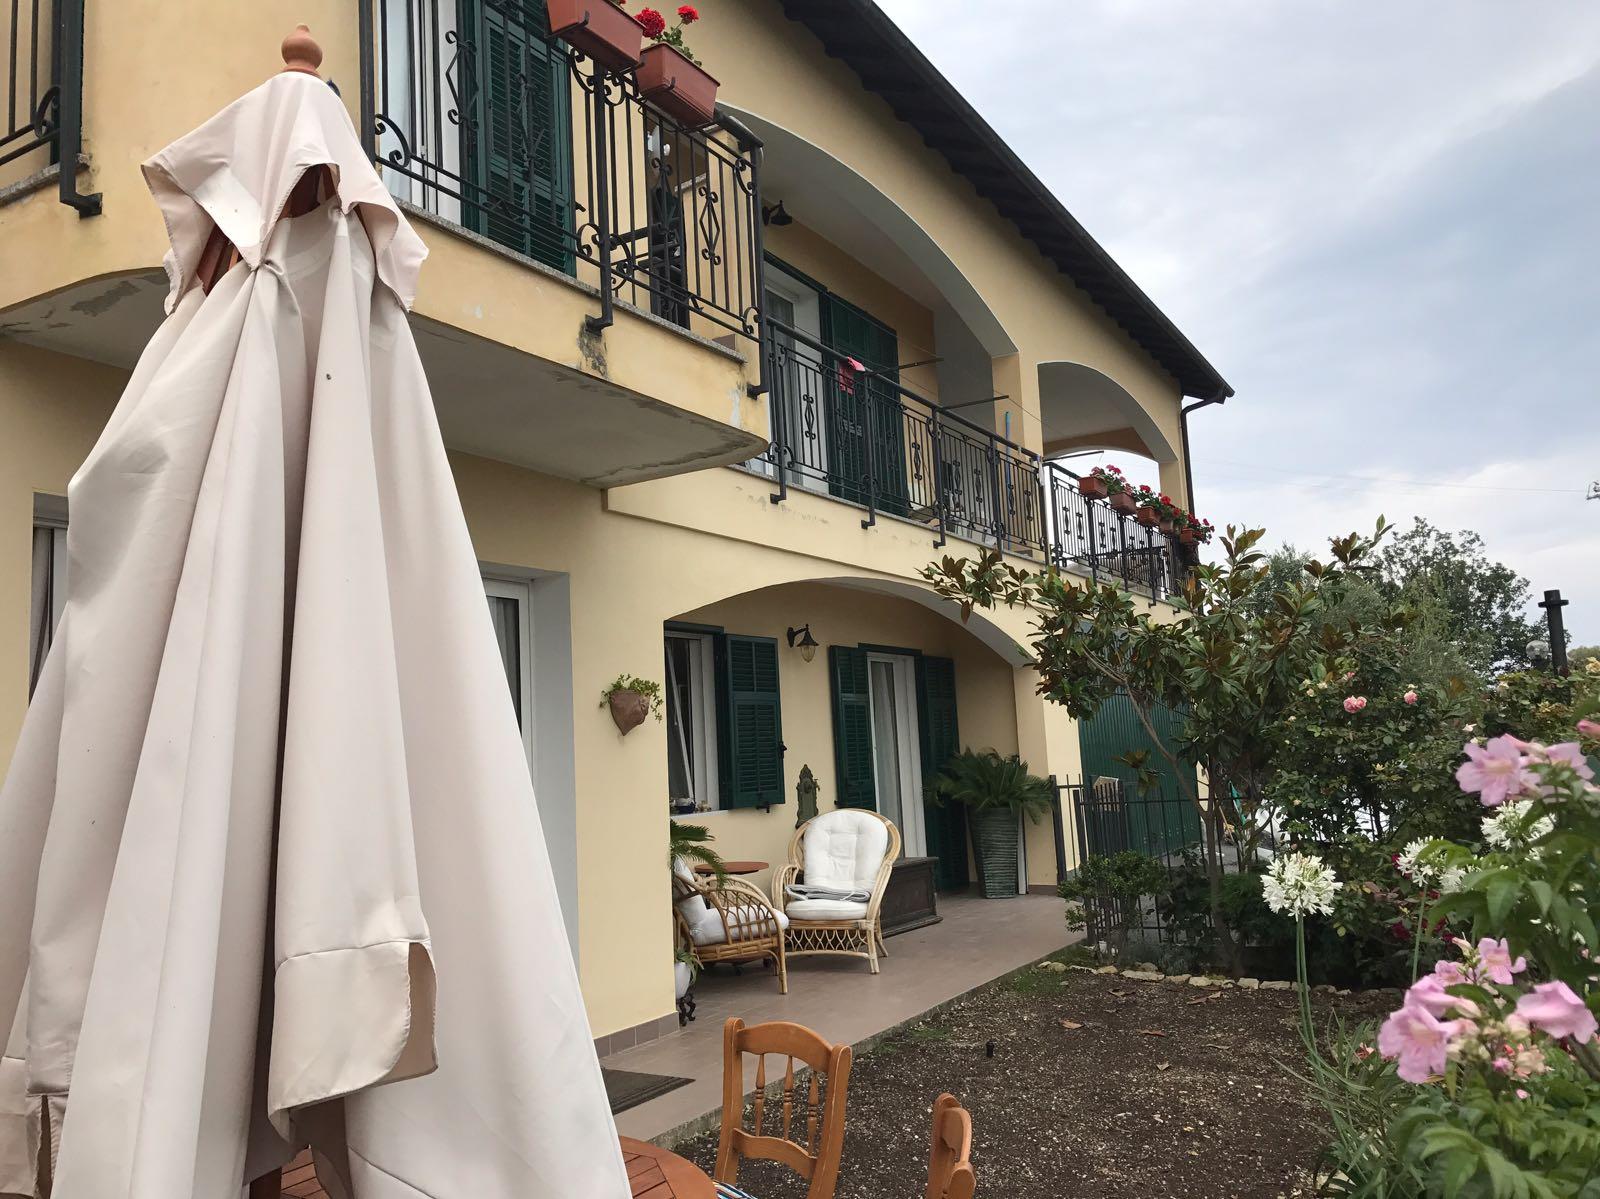 1-0518 Вилла у моря в аренду, Оспидалетти (Италия)